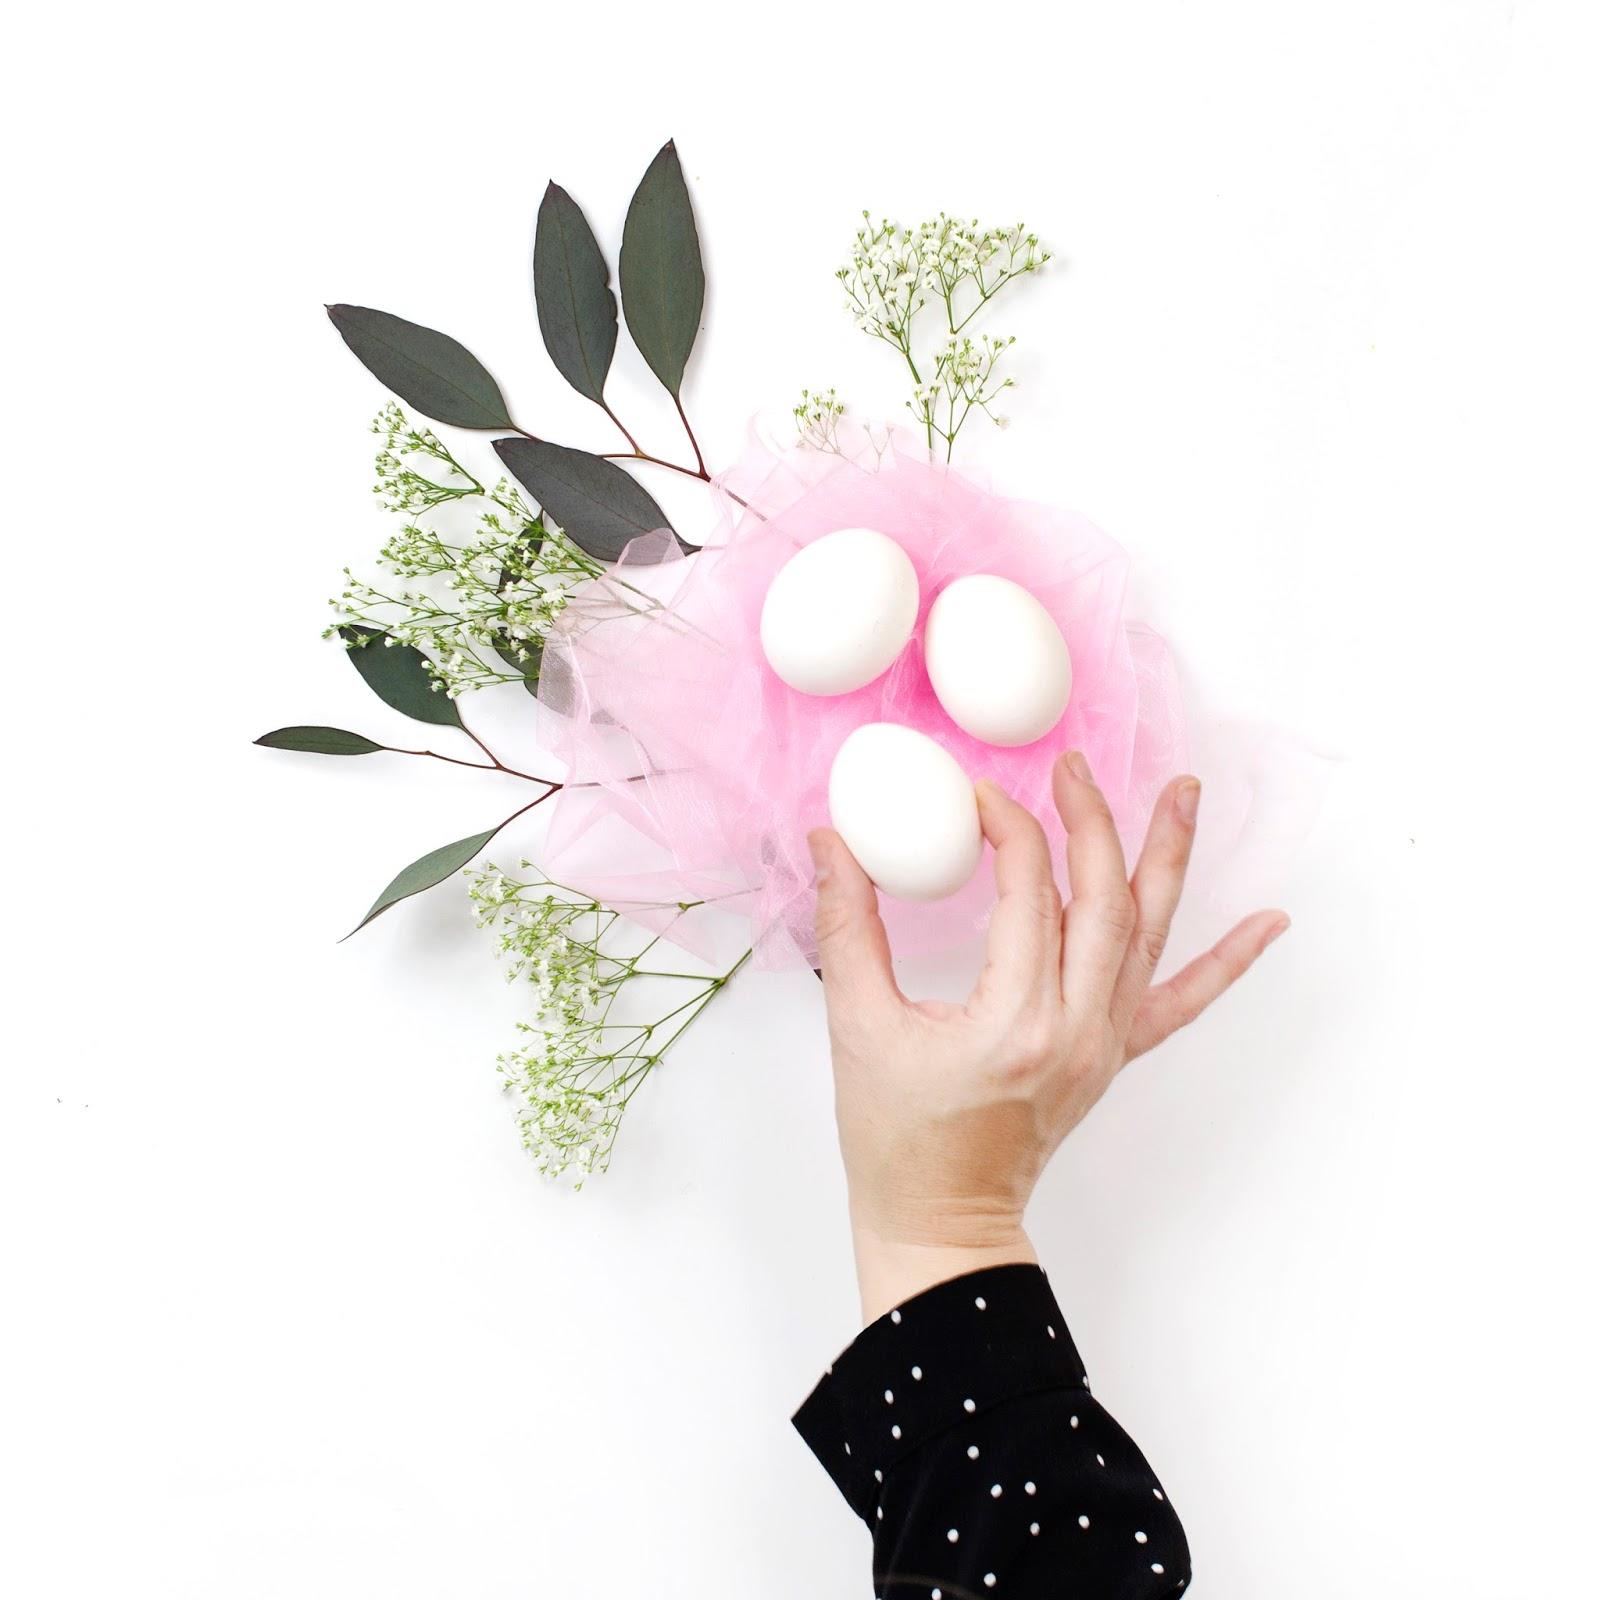 cruelty-free beauty, spring nail polish, spring nail colors, cruelty-free nail polish